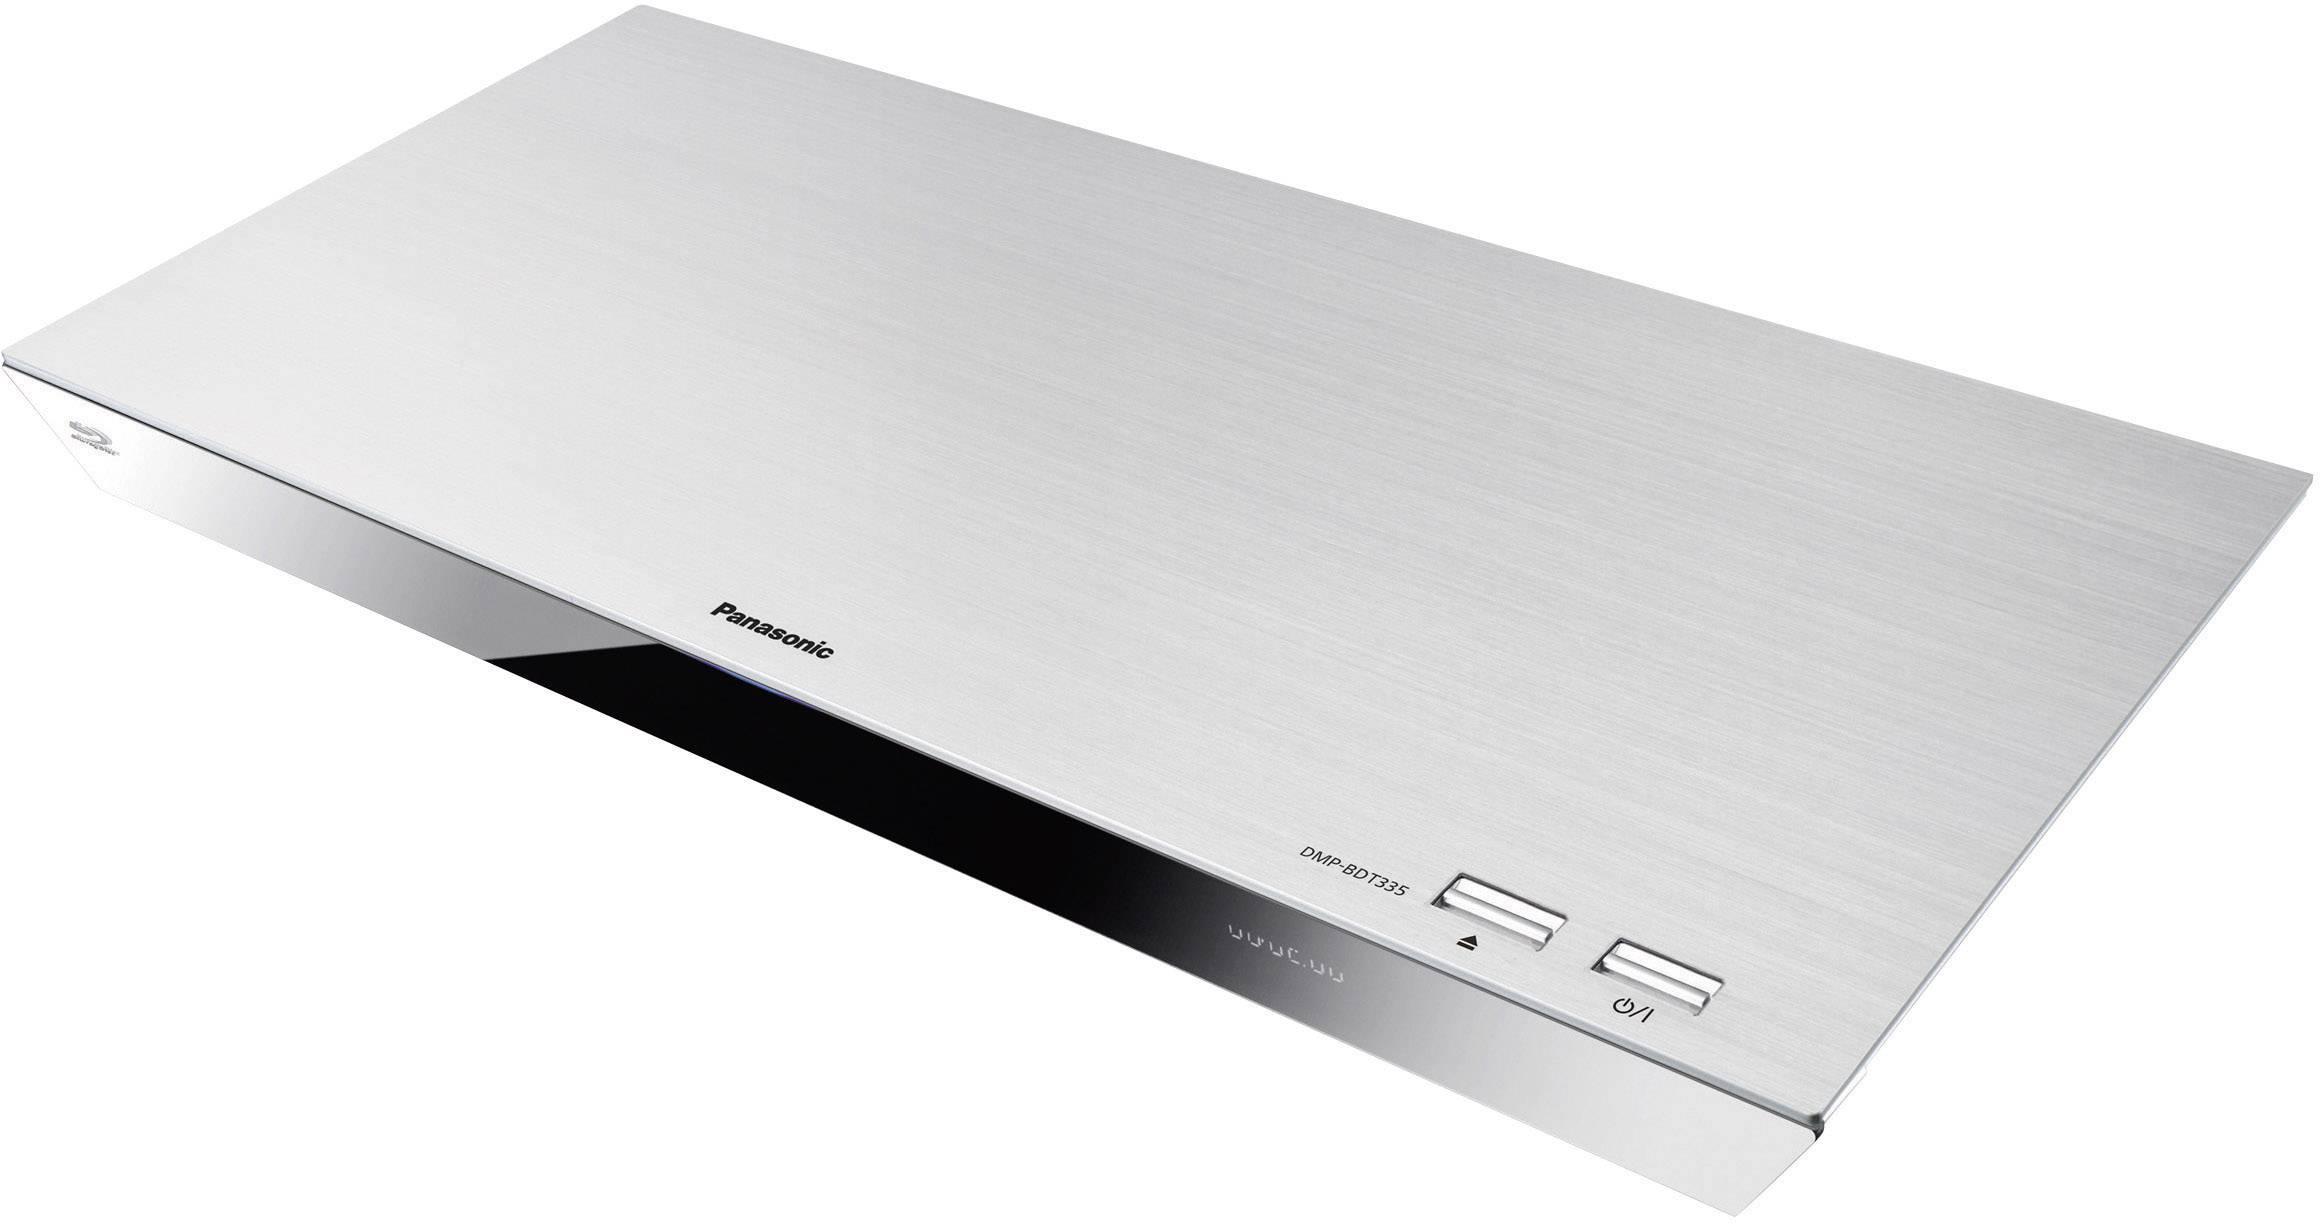 Panasonic DMP-BDT335EG Blu-ray Player Driver